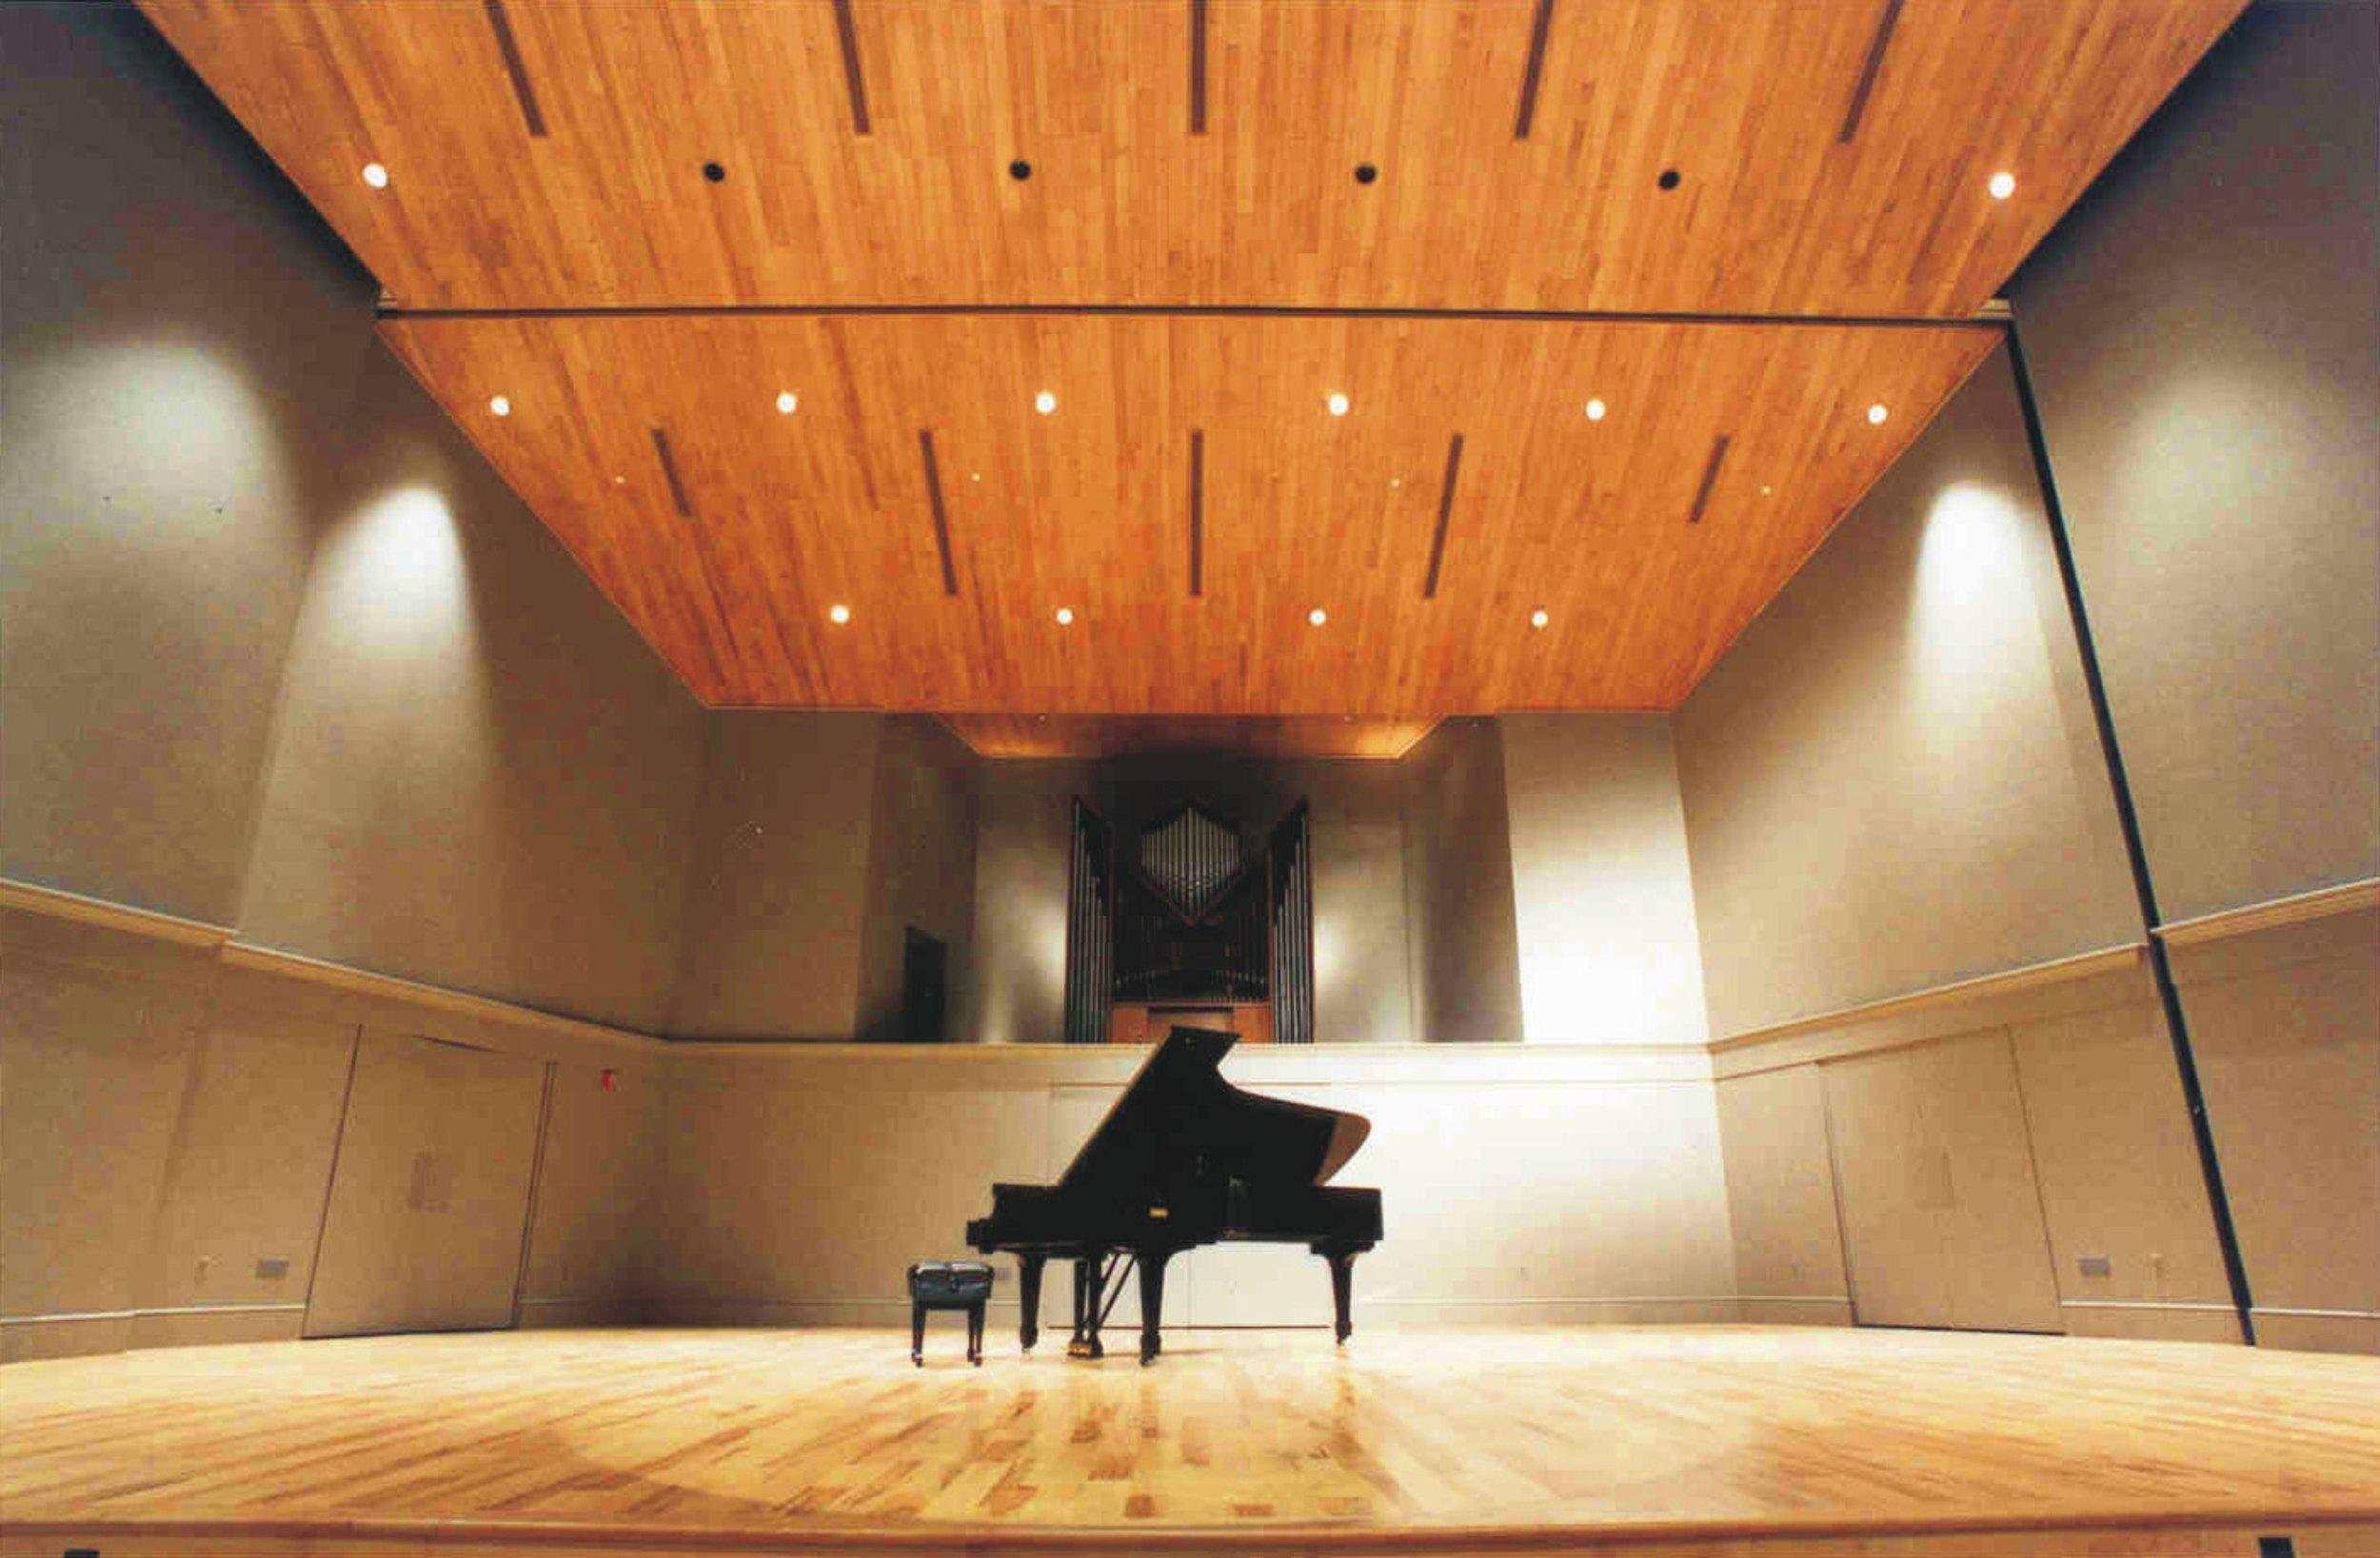 Yoder Recital Hall, Bluffton University